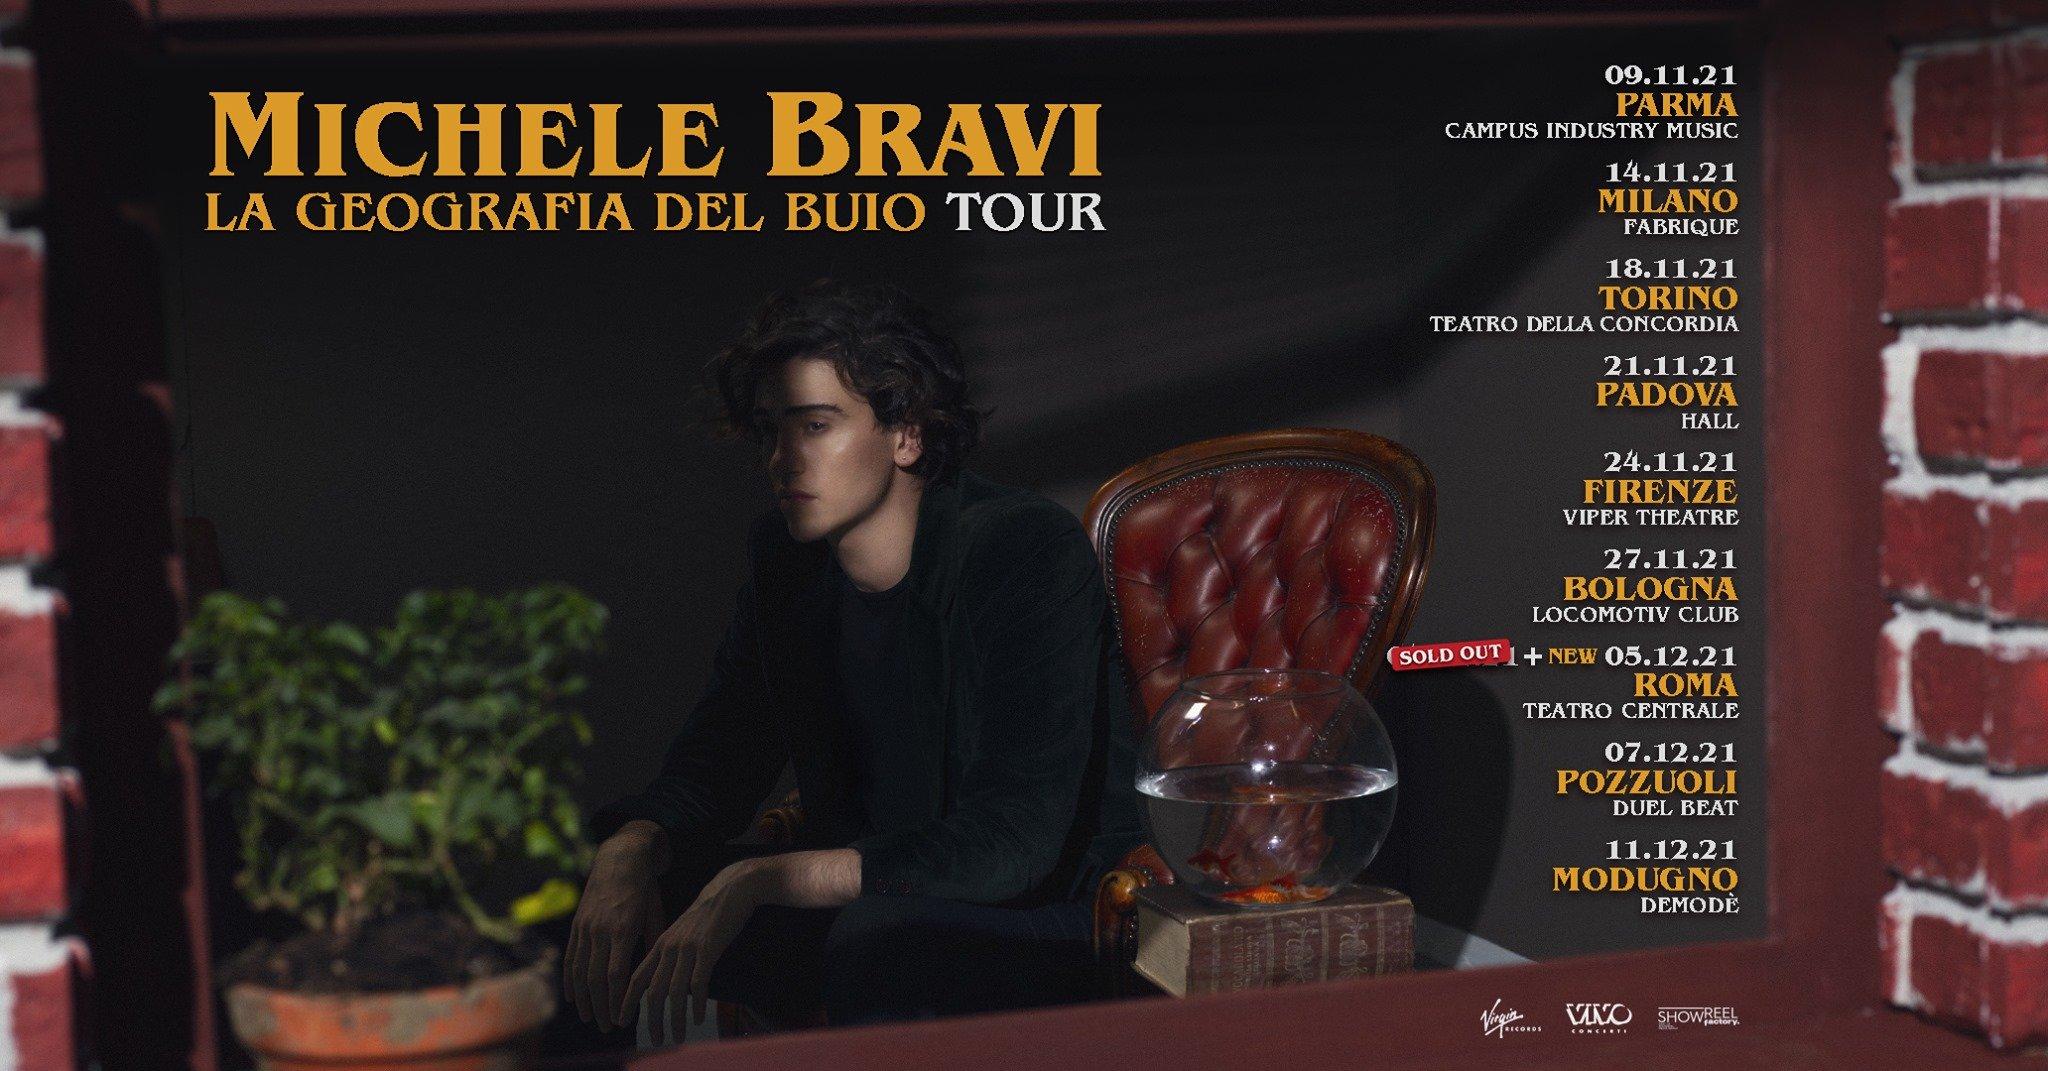 Michele Bravi in concerto, Hall Padova